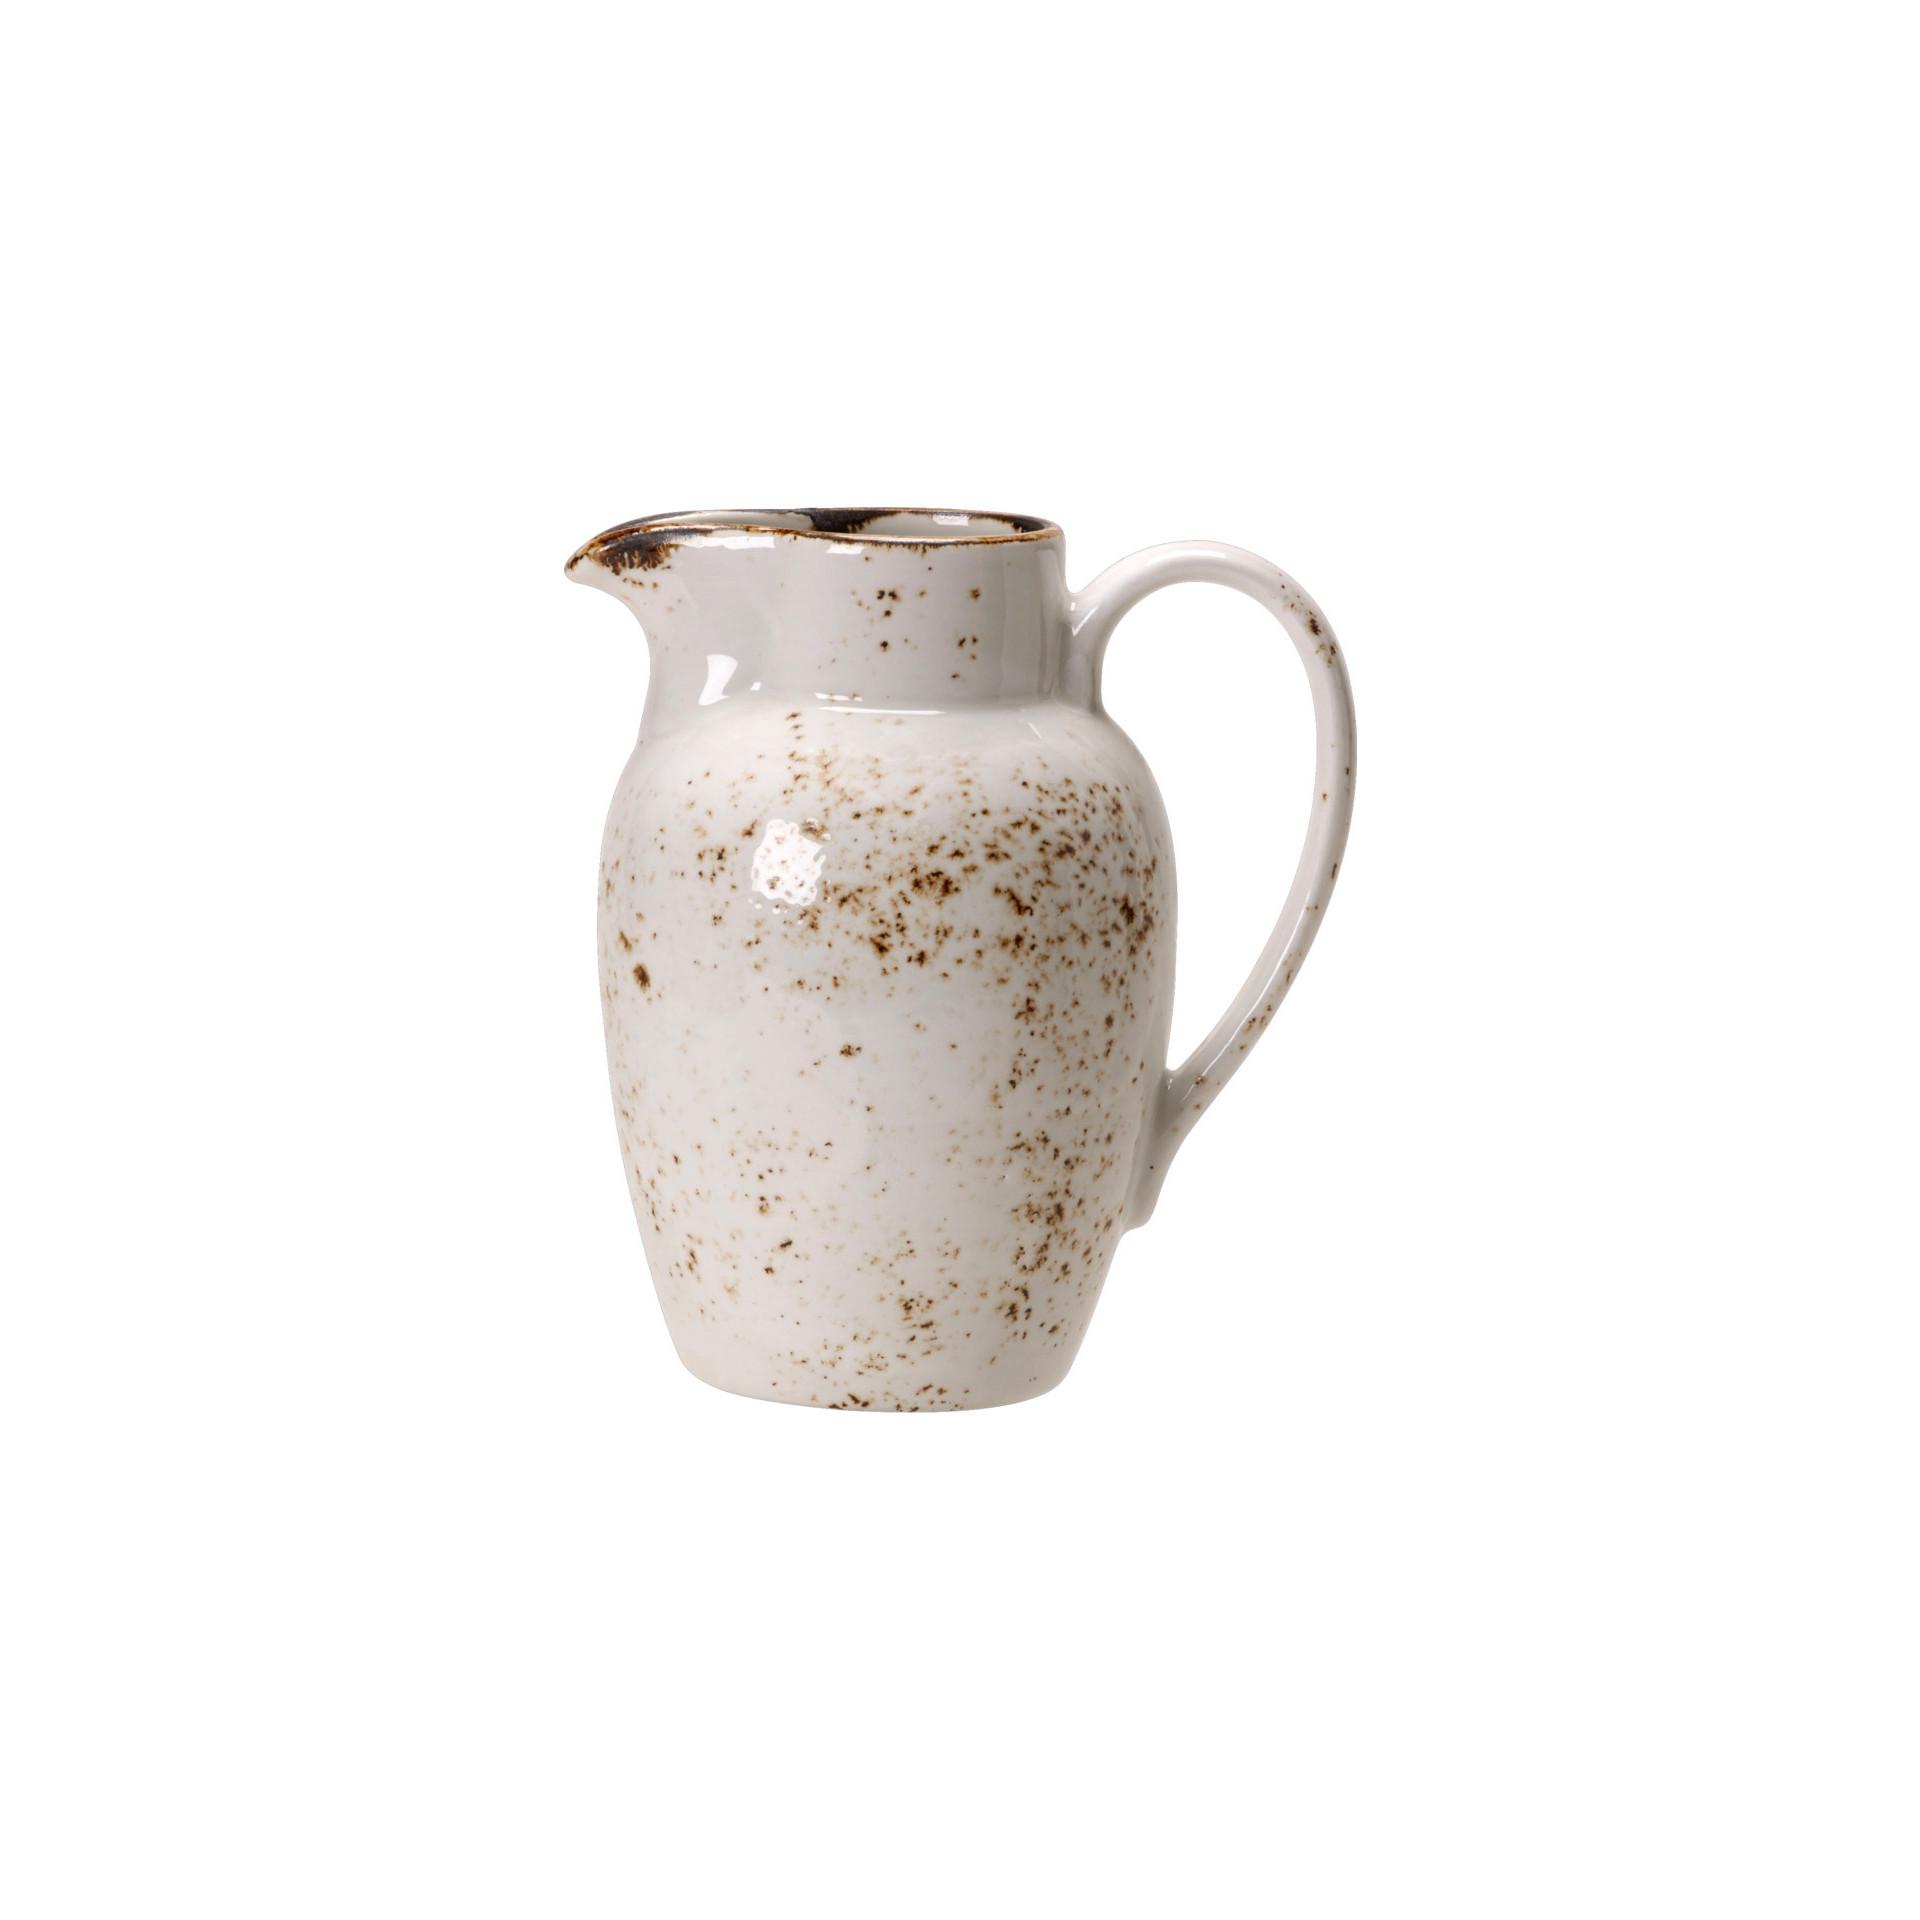 Craft White, Krug 0,60 l